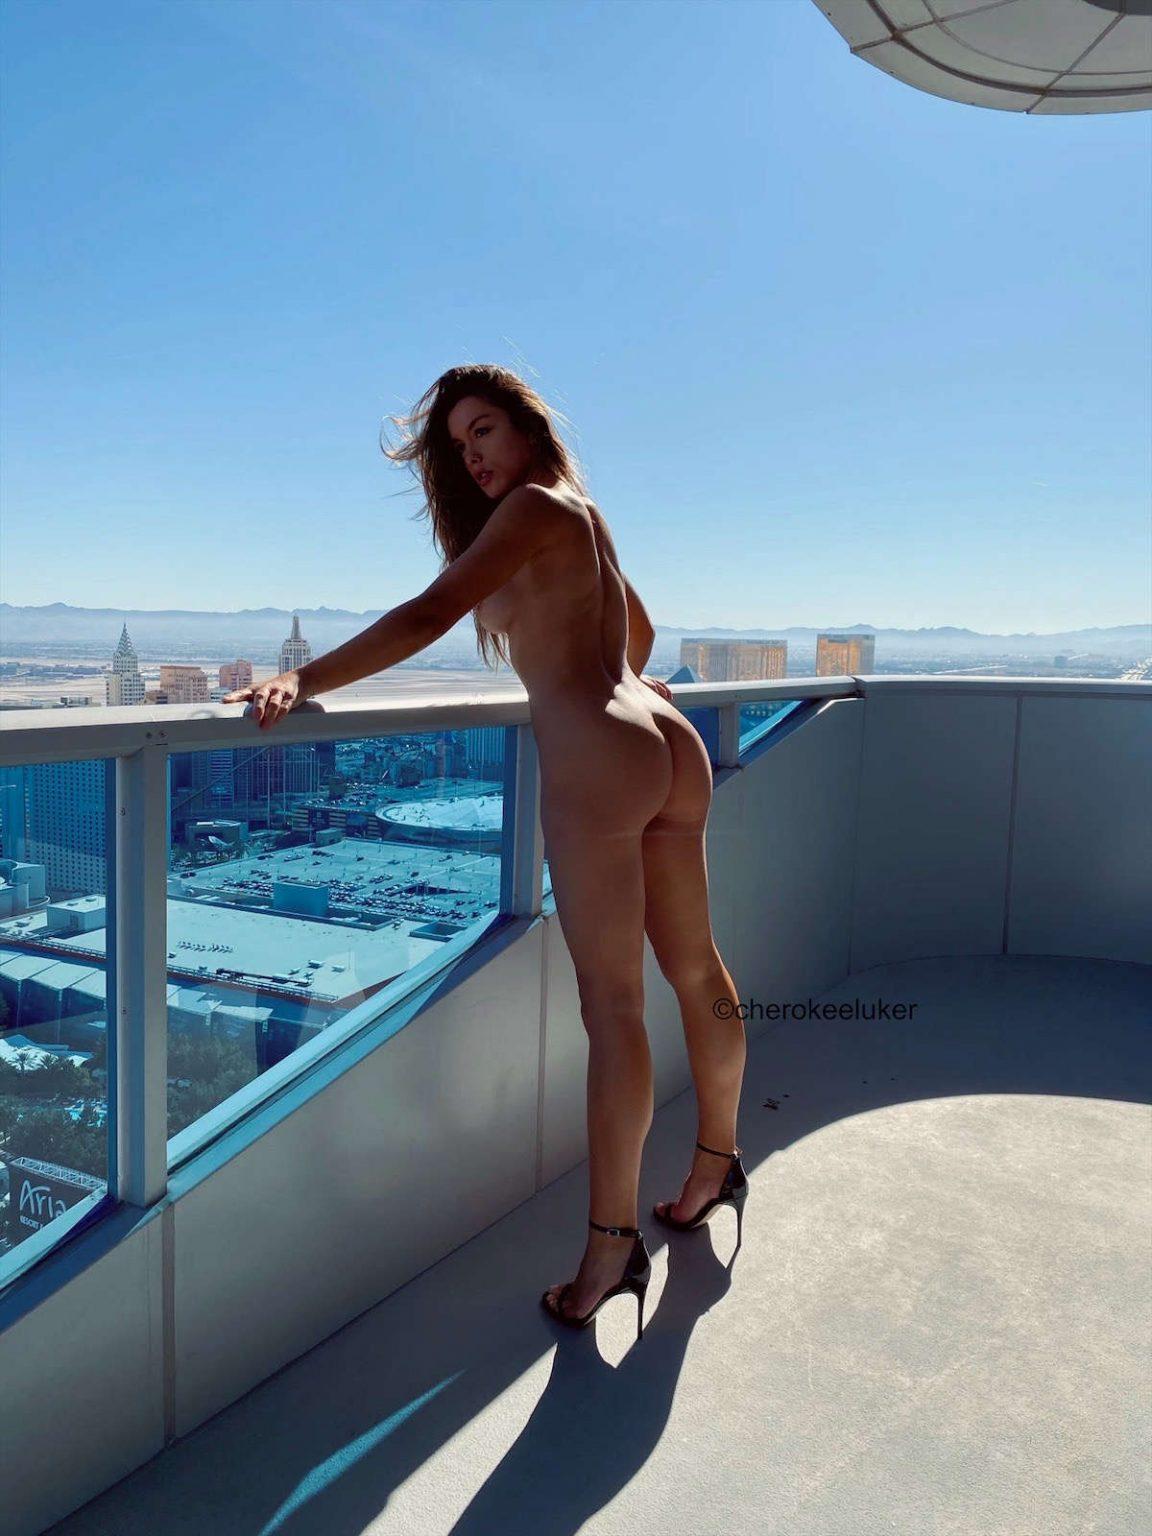 Fit-Naked-Girls-com-Cherokee-Luker-nude-fit-22-1152x1536